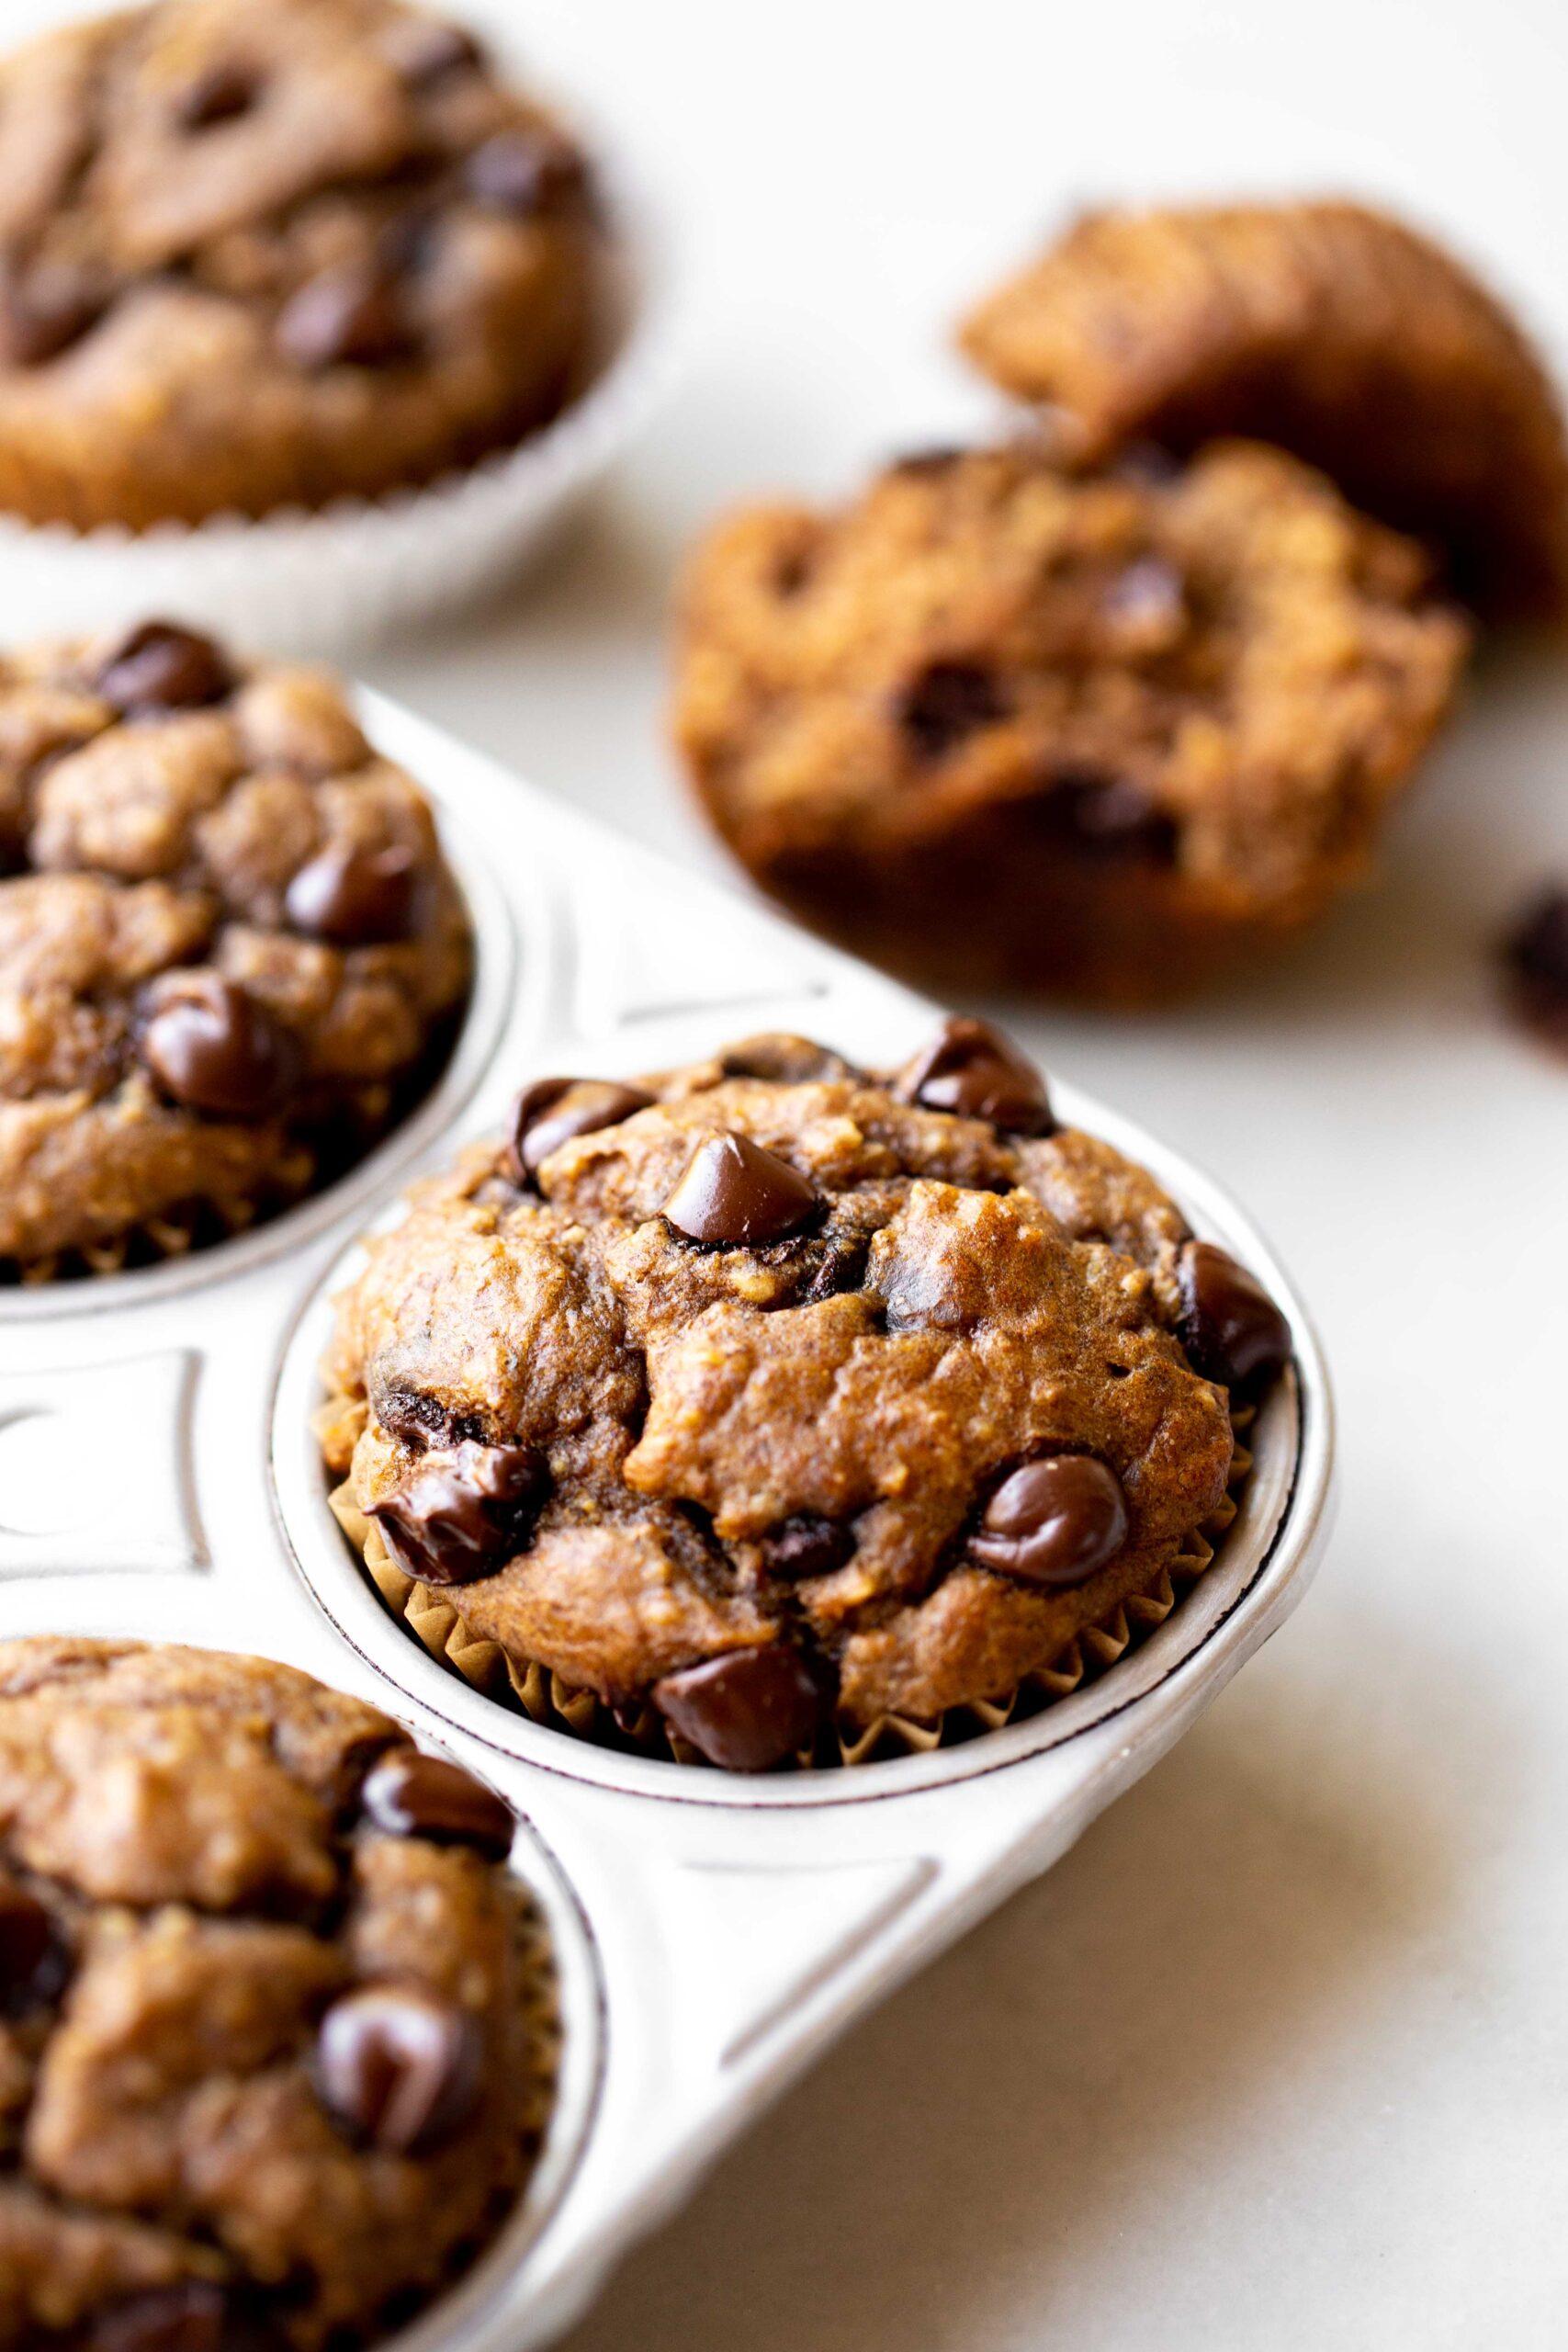 Healthy Chocolate Chip Banana Muffins Modern Minimalism